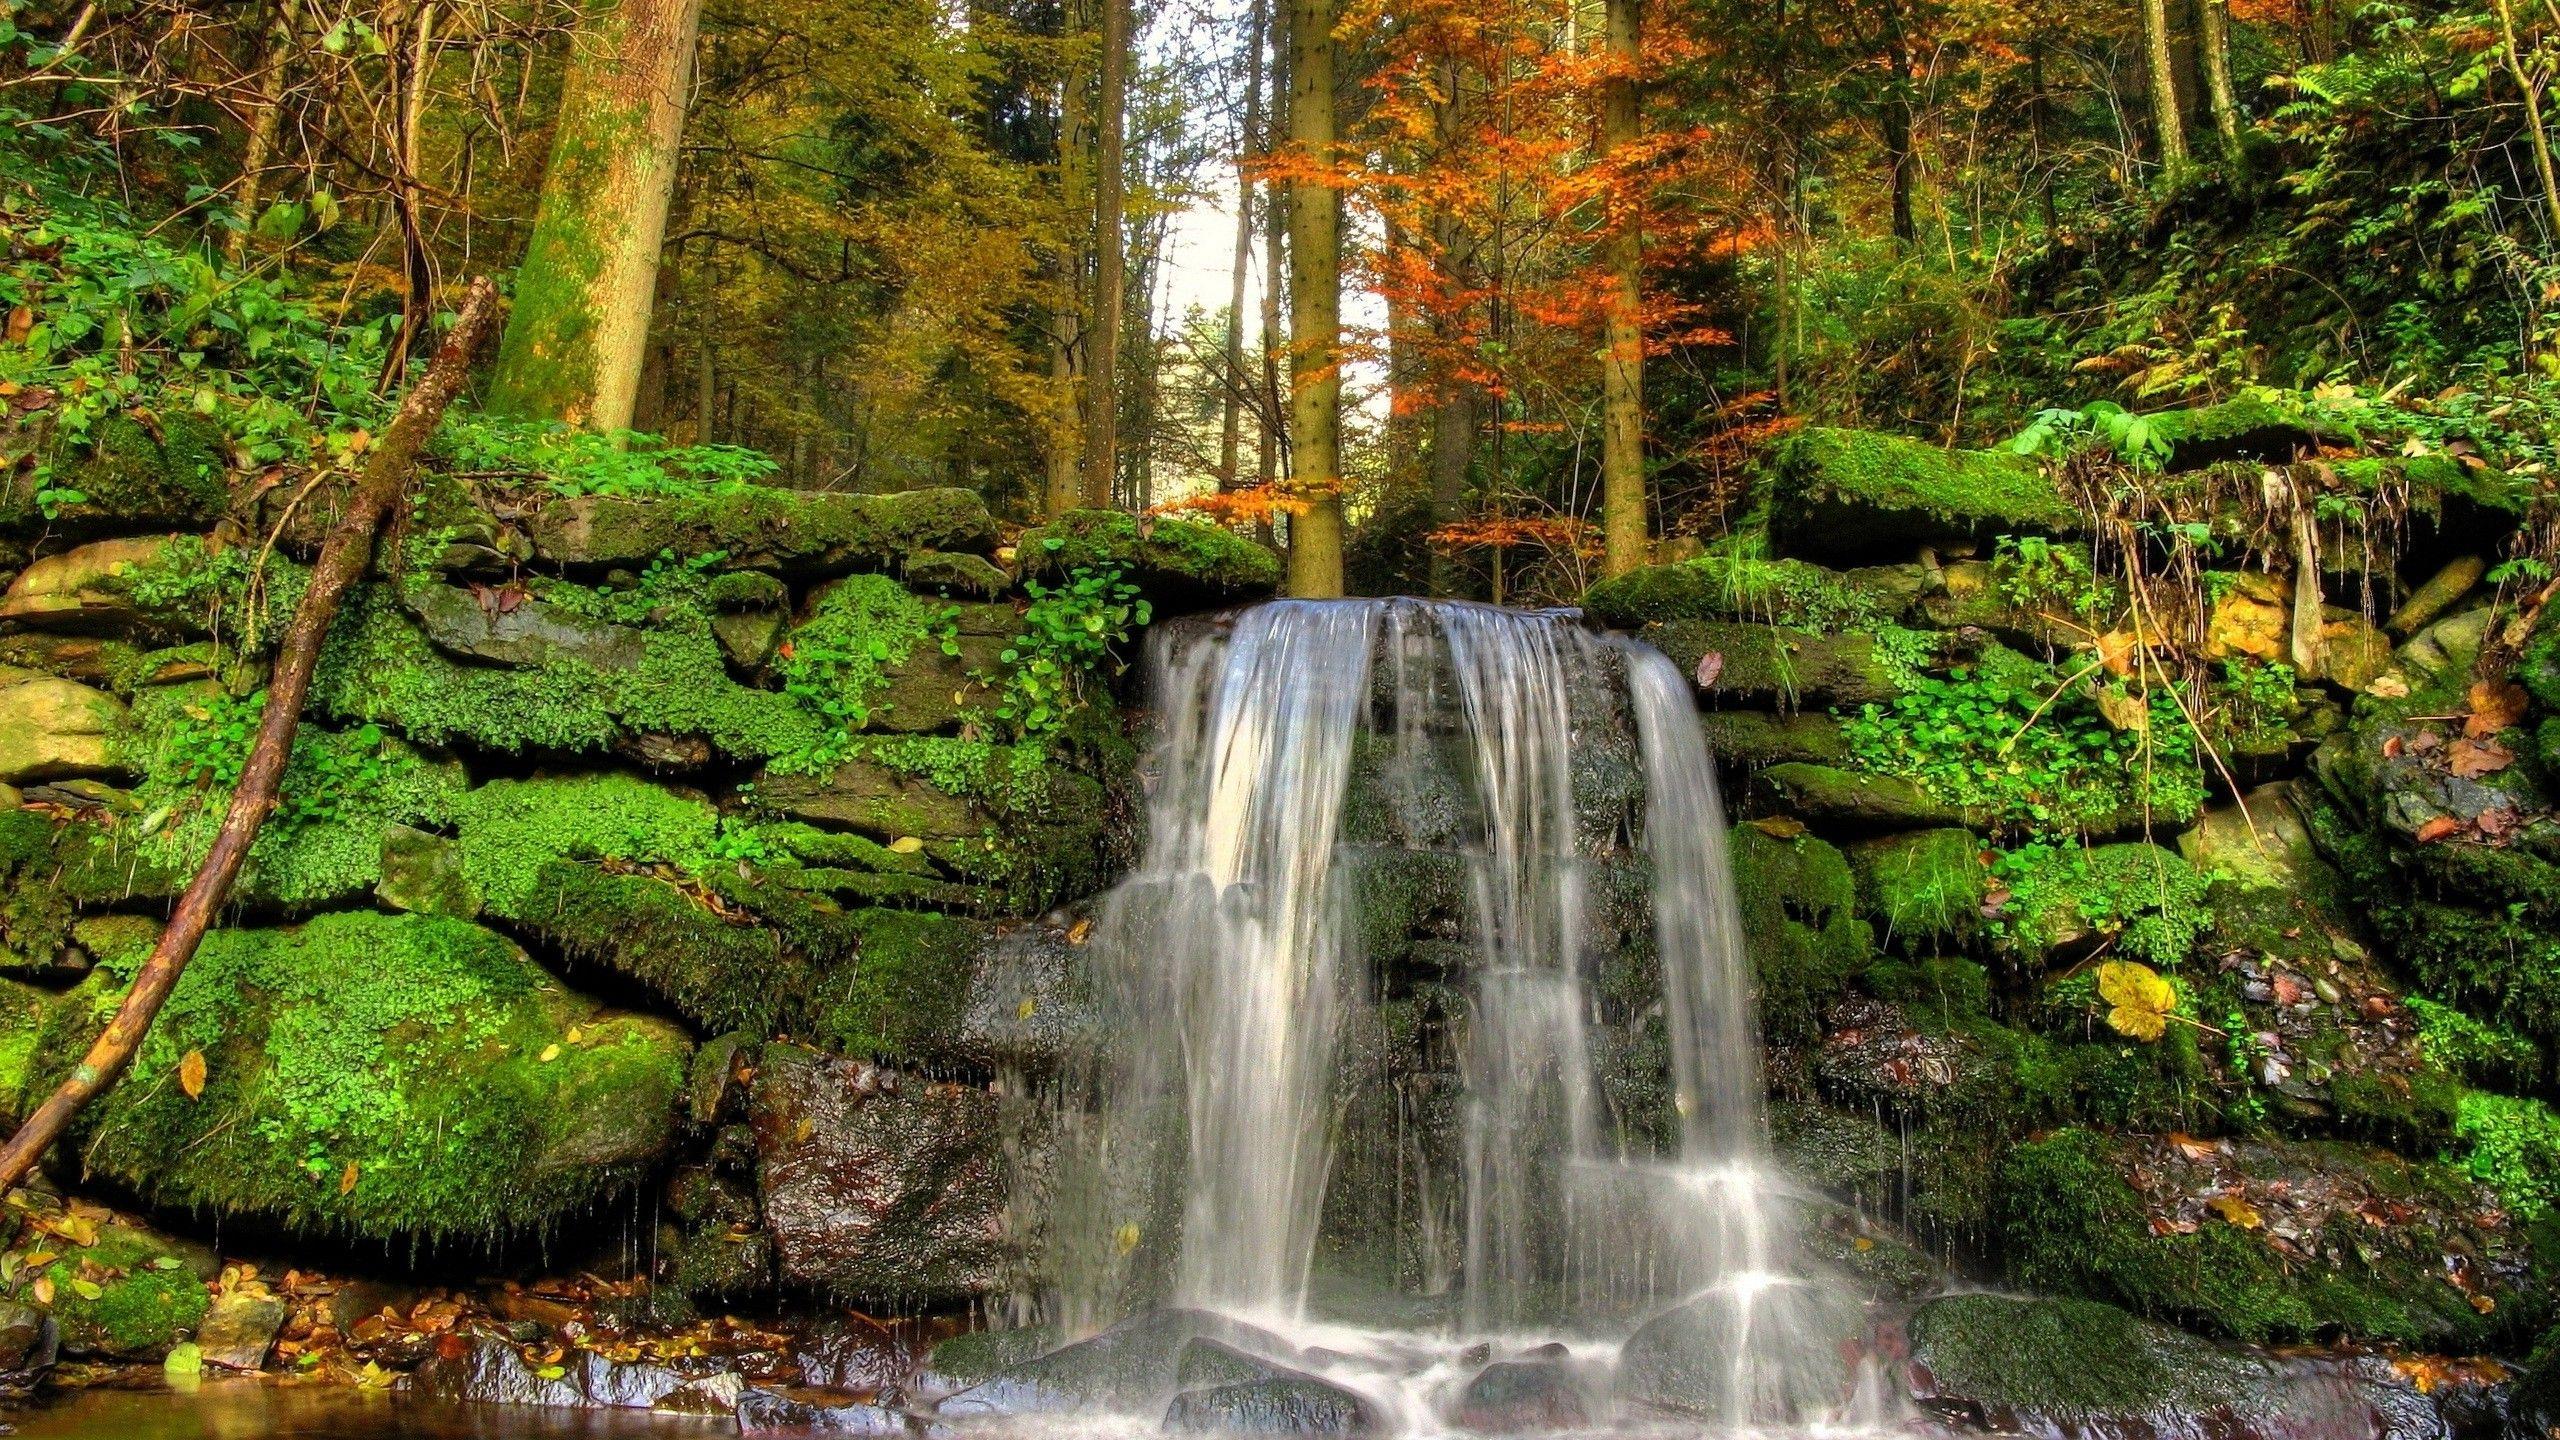 paisajes piedras naturaleza cae vegetación de musgo | Proyectos que ...